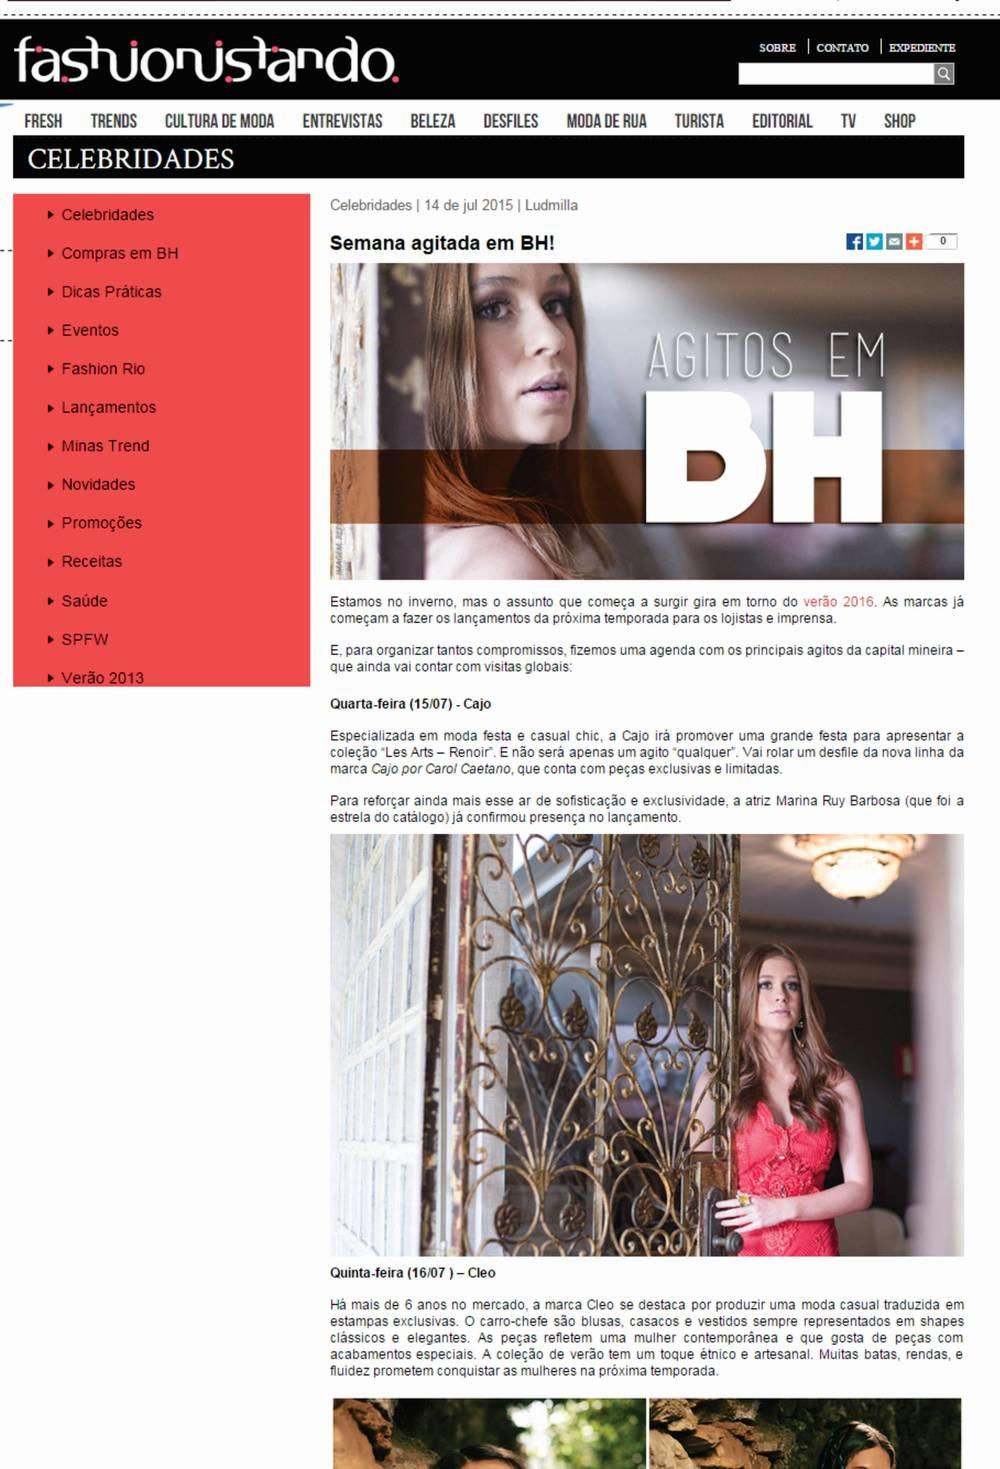 Cajo  - Site Fashionistando - 14-07-2015.jpg